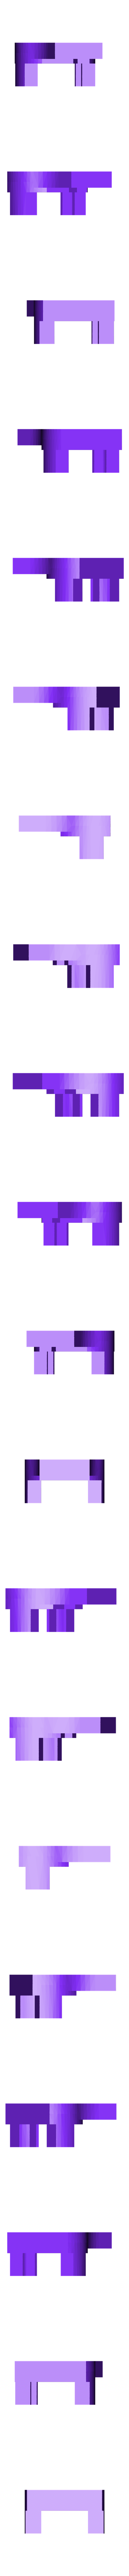 1902-02_Part01_1.STL Download free STL file Satnav holder • 3D printer template, EL3D